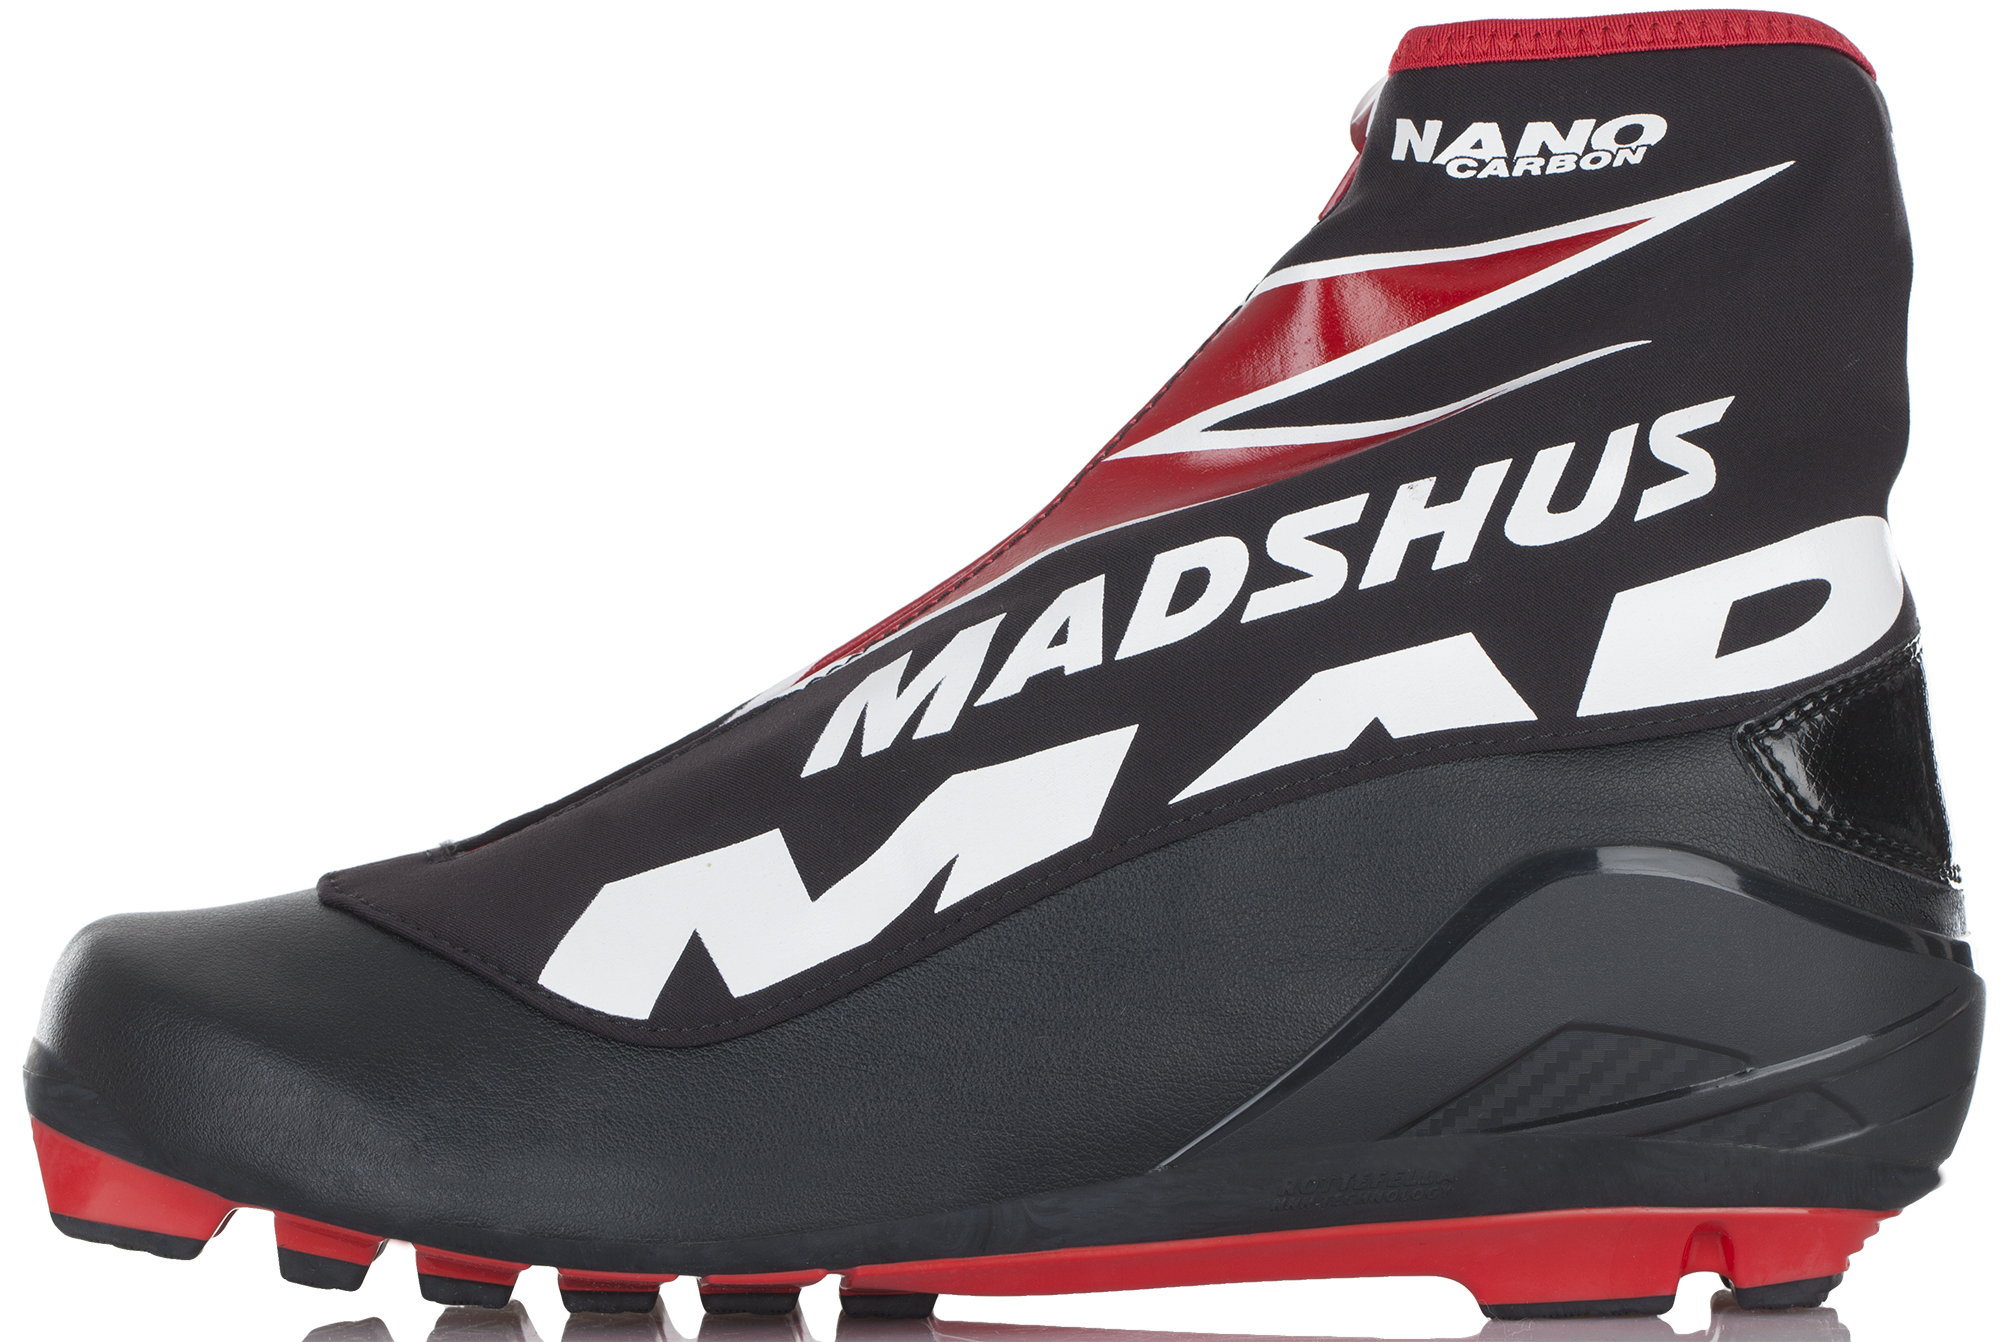 Madshus Ботинки для беговых лыж Madshus Nano Carbon Classic madshus палки для беговых лыж madshus activesonic